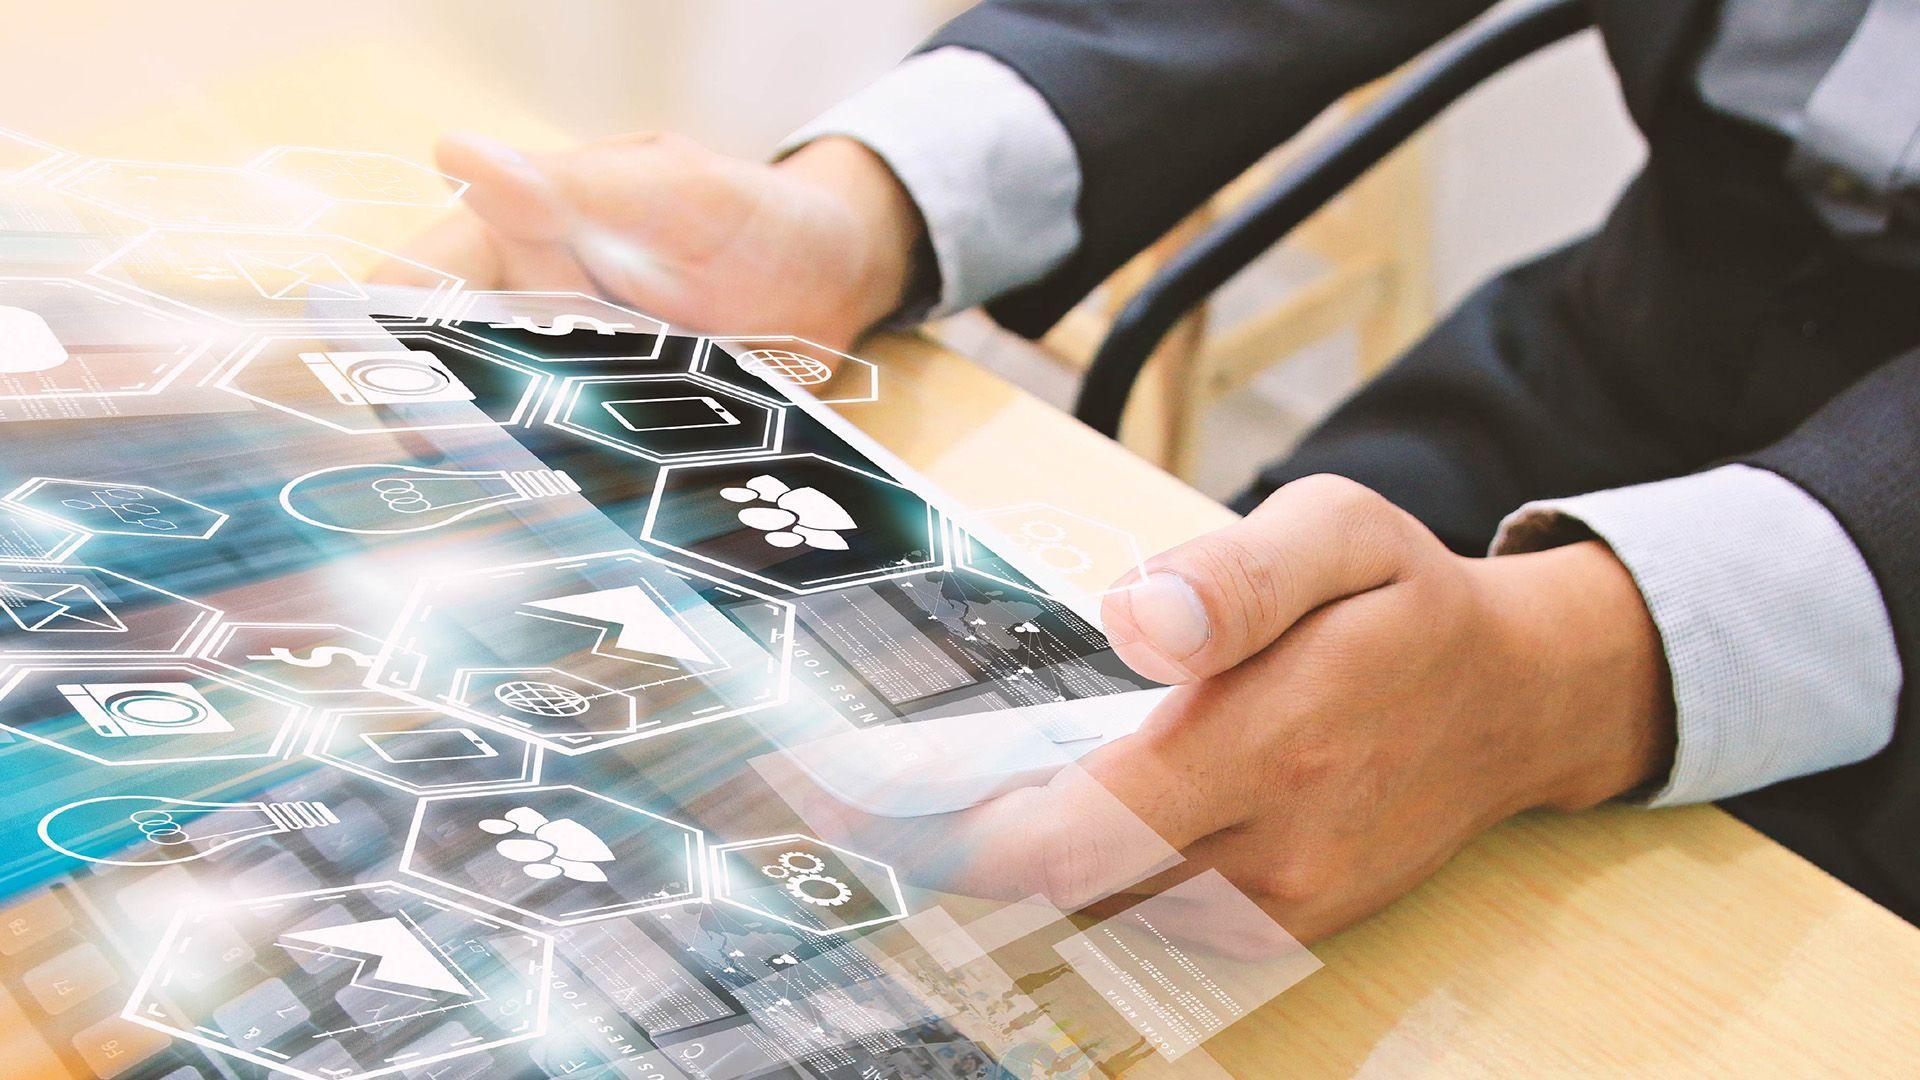 Digital technologies and future of publishing – STM Publishing